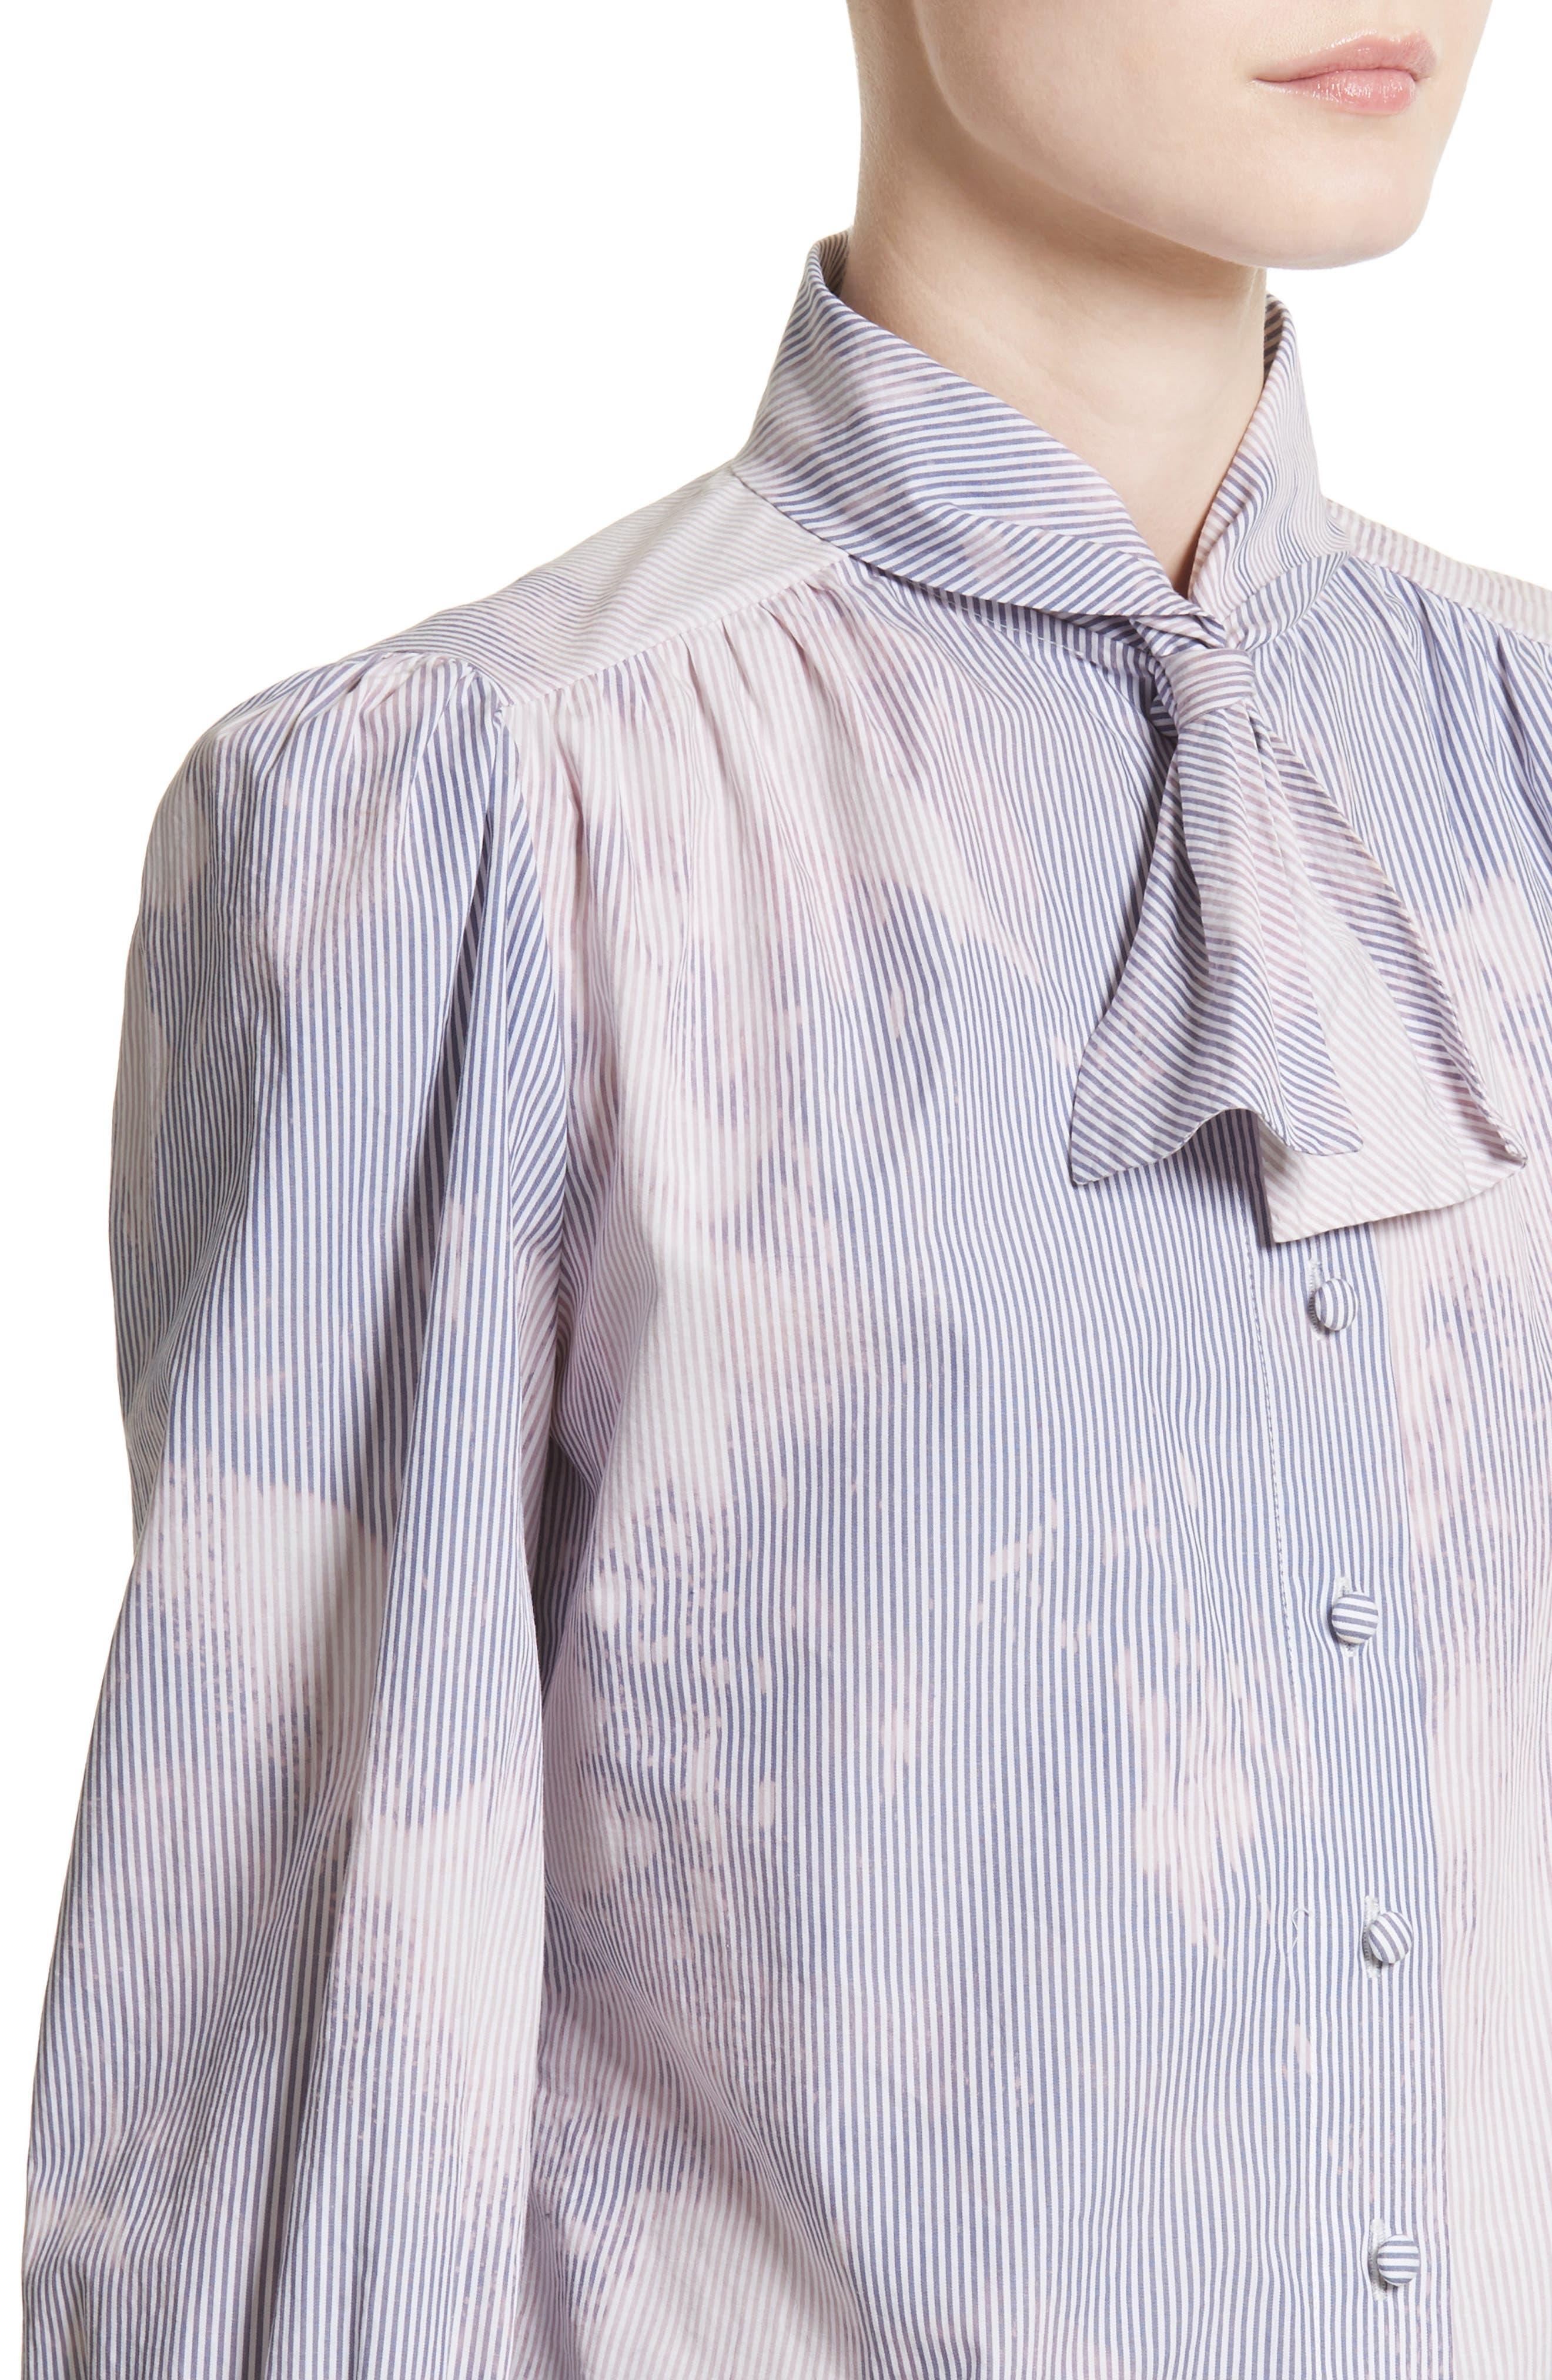 Hand Tie Dye Boy Scout Blouse,                             Alternate thumbnail 4, color,                             400